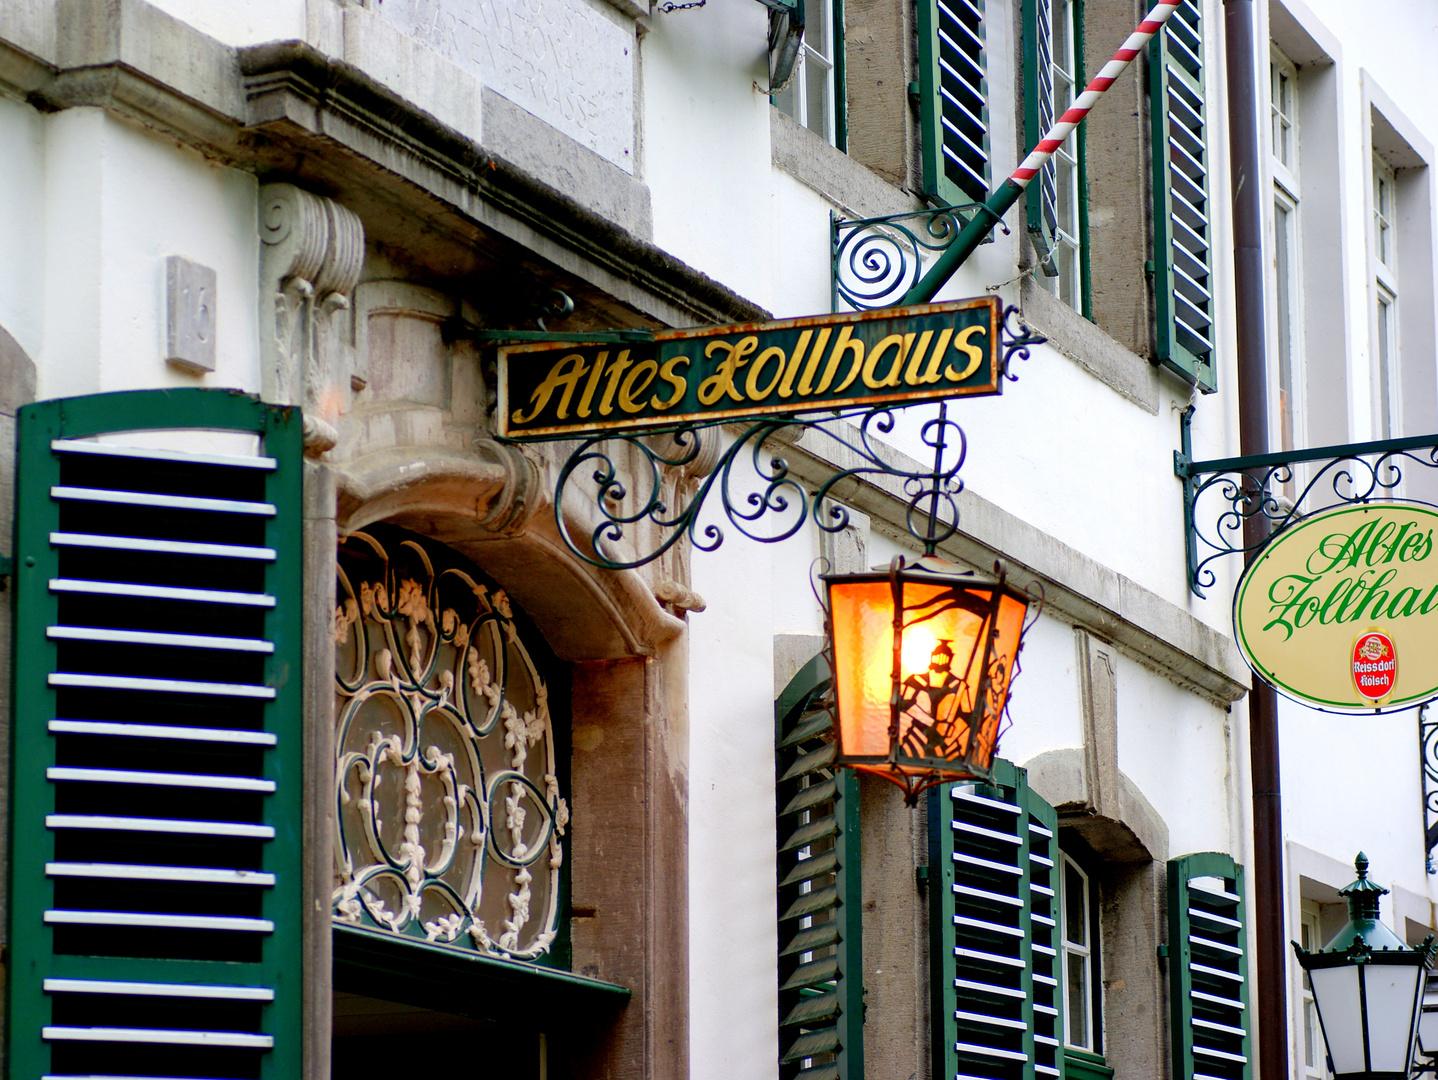 uriges Restaurant in Zons